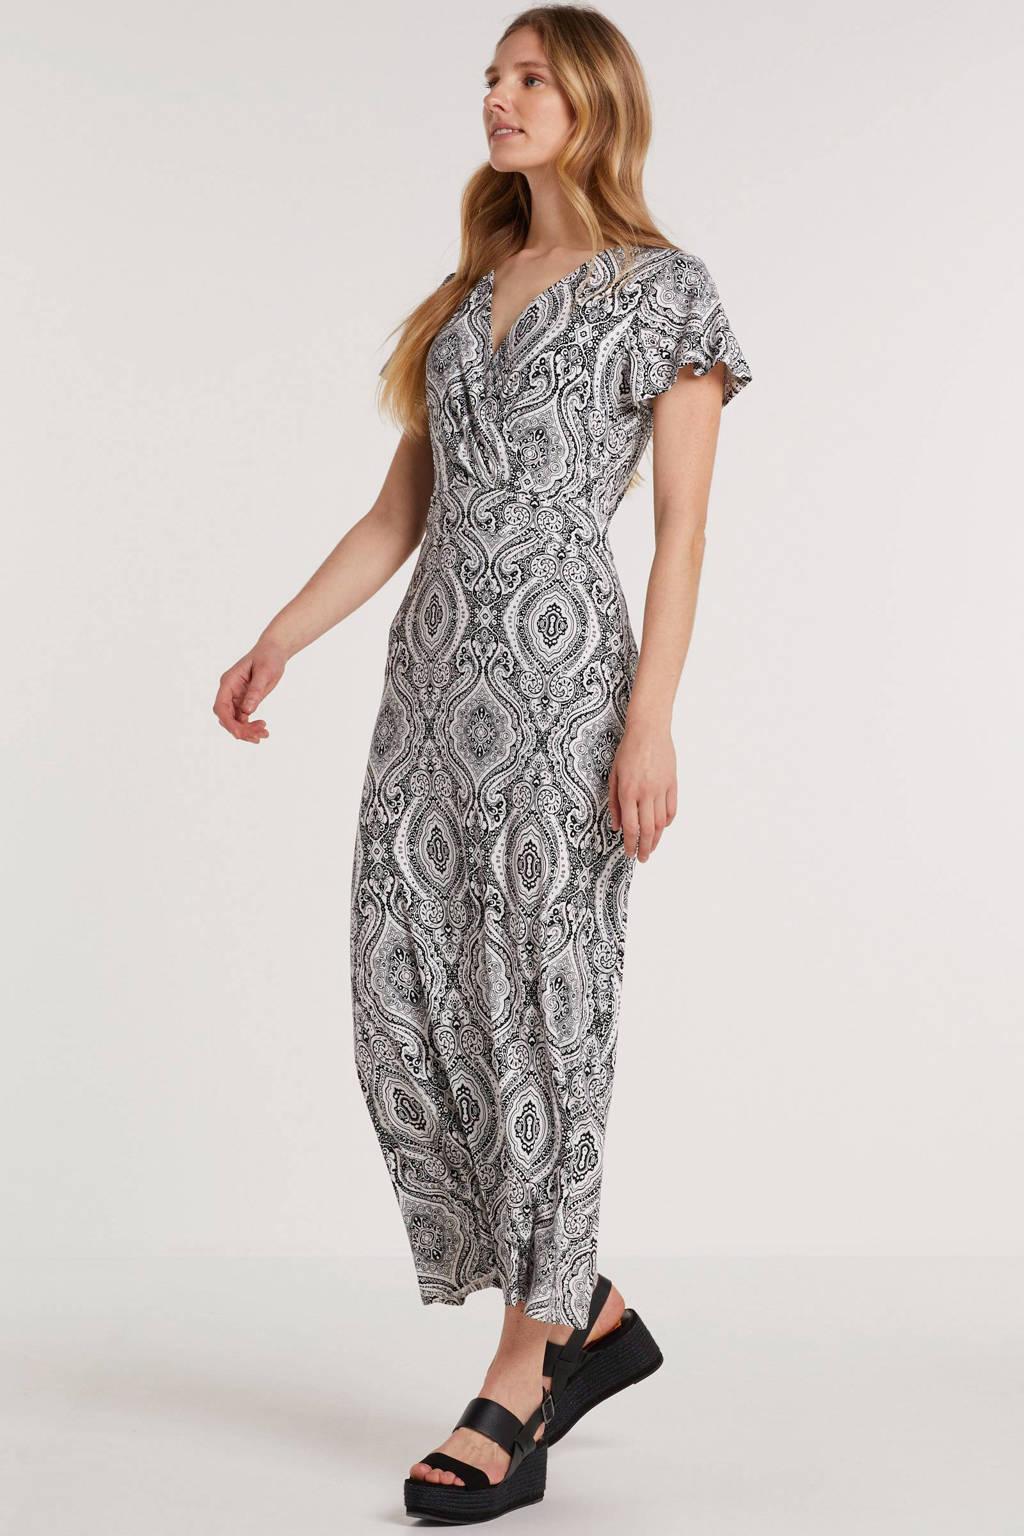 Smashed Lemon maxi jurk met all over print zwart/wit, Zwart/wit